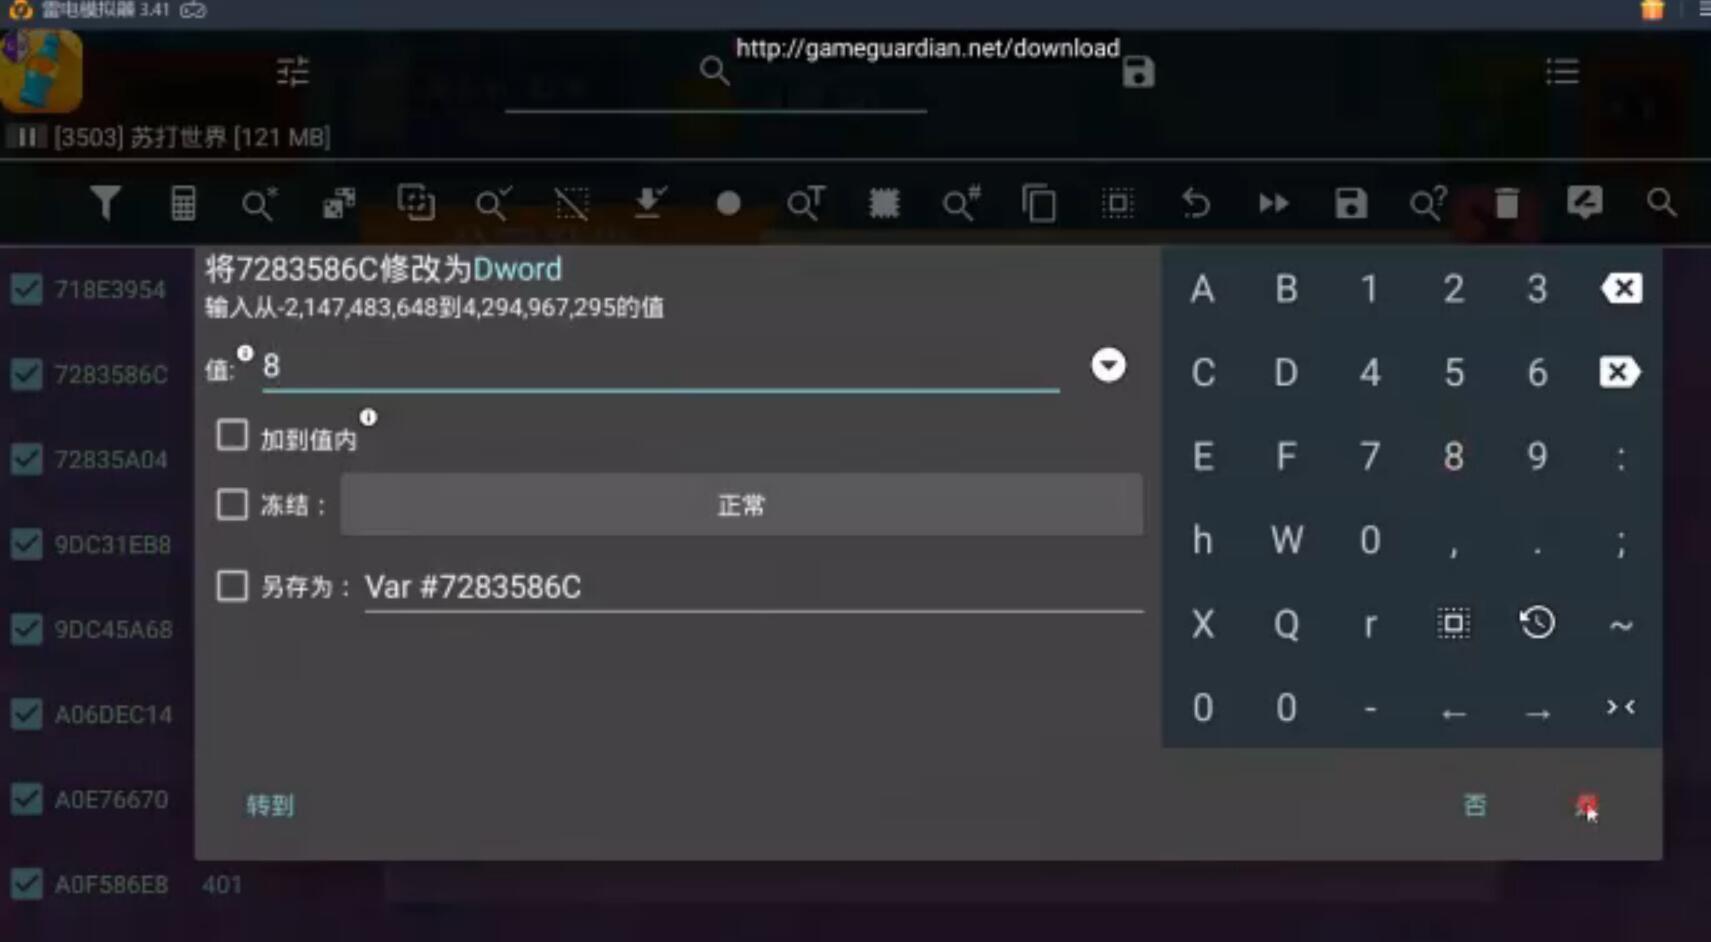 [GG修改器 联合搜索教程]